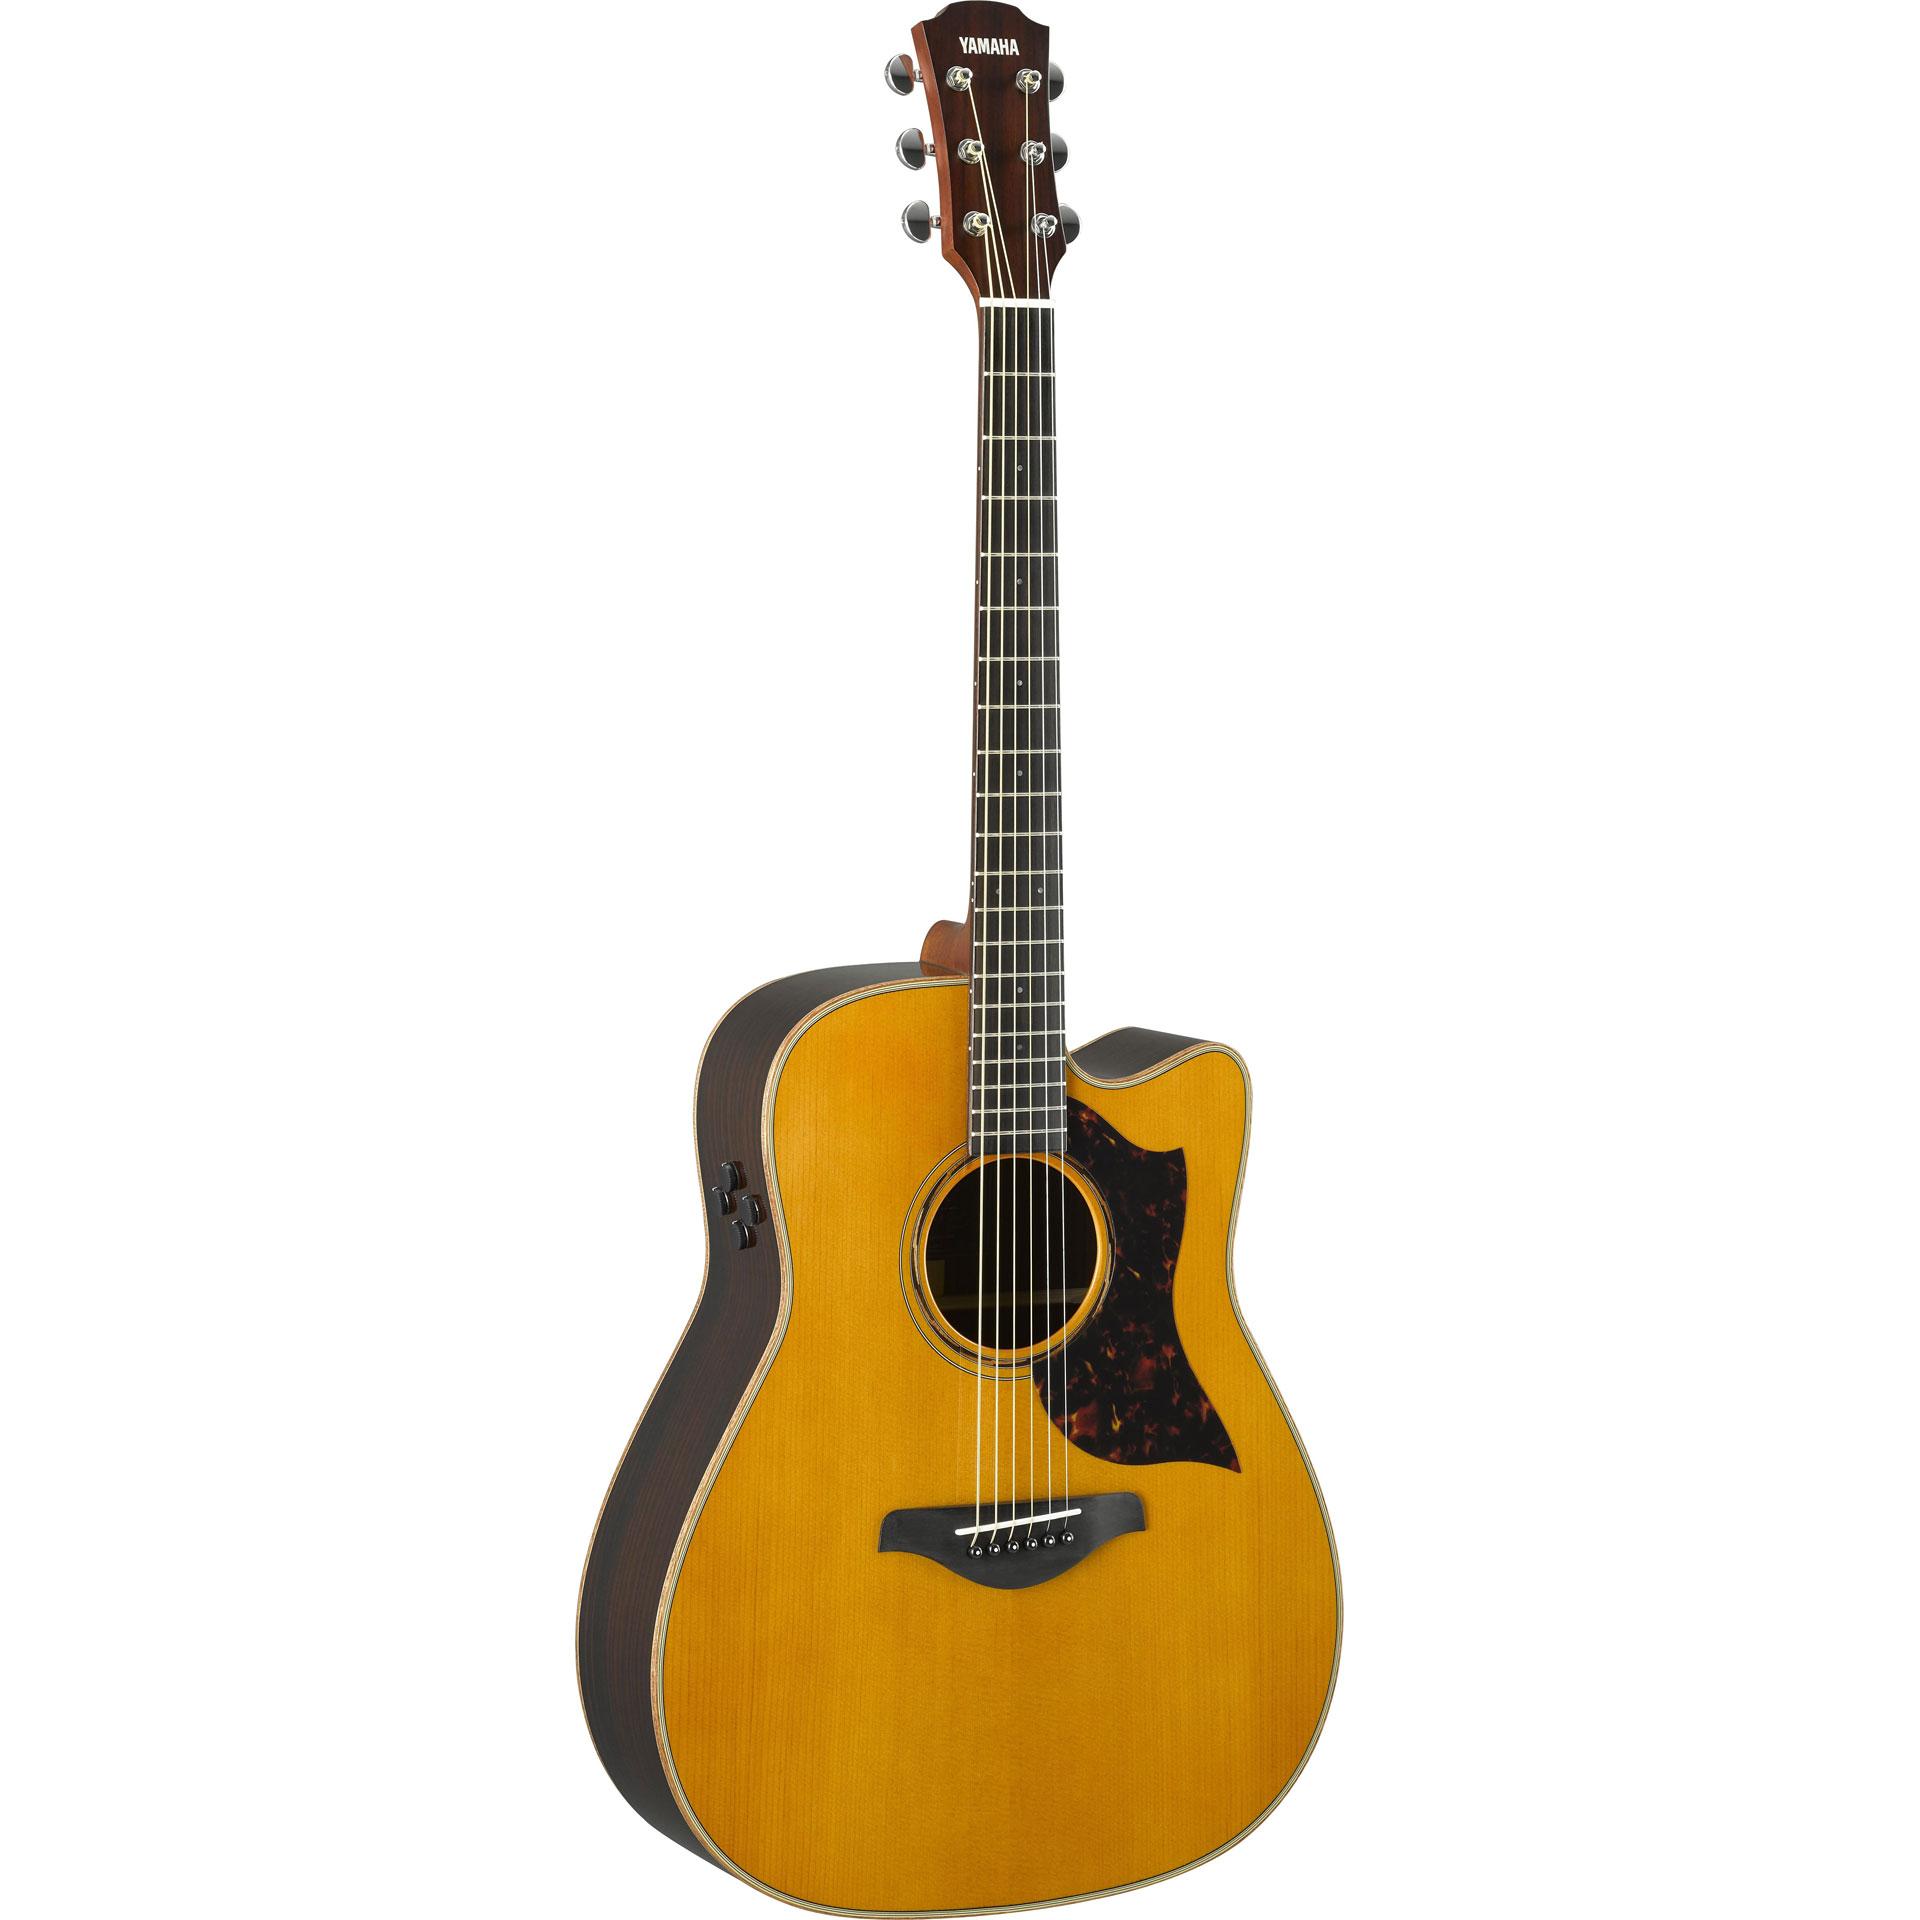 yamaha a3r are guitare acoustique. Black Bedroom Furniture Sets. Home Design Ideas